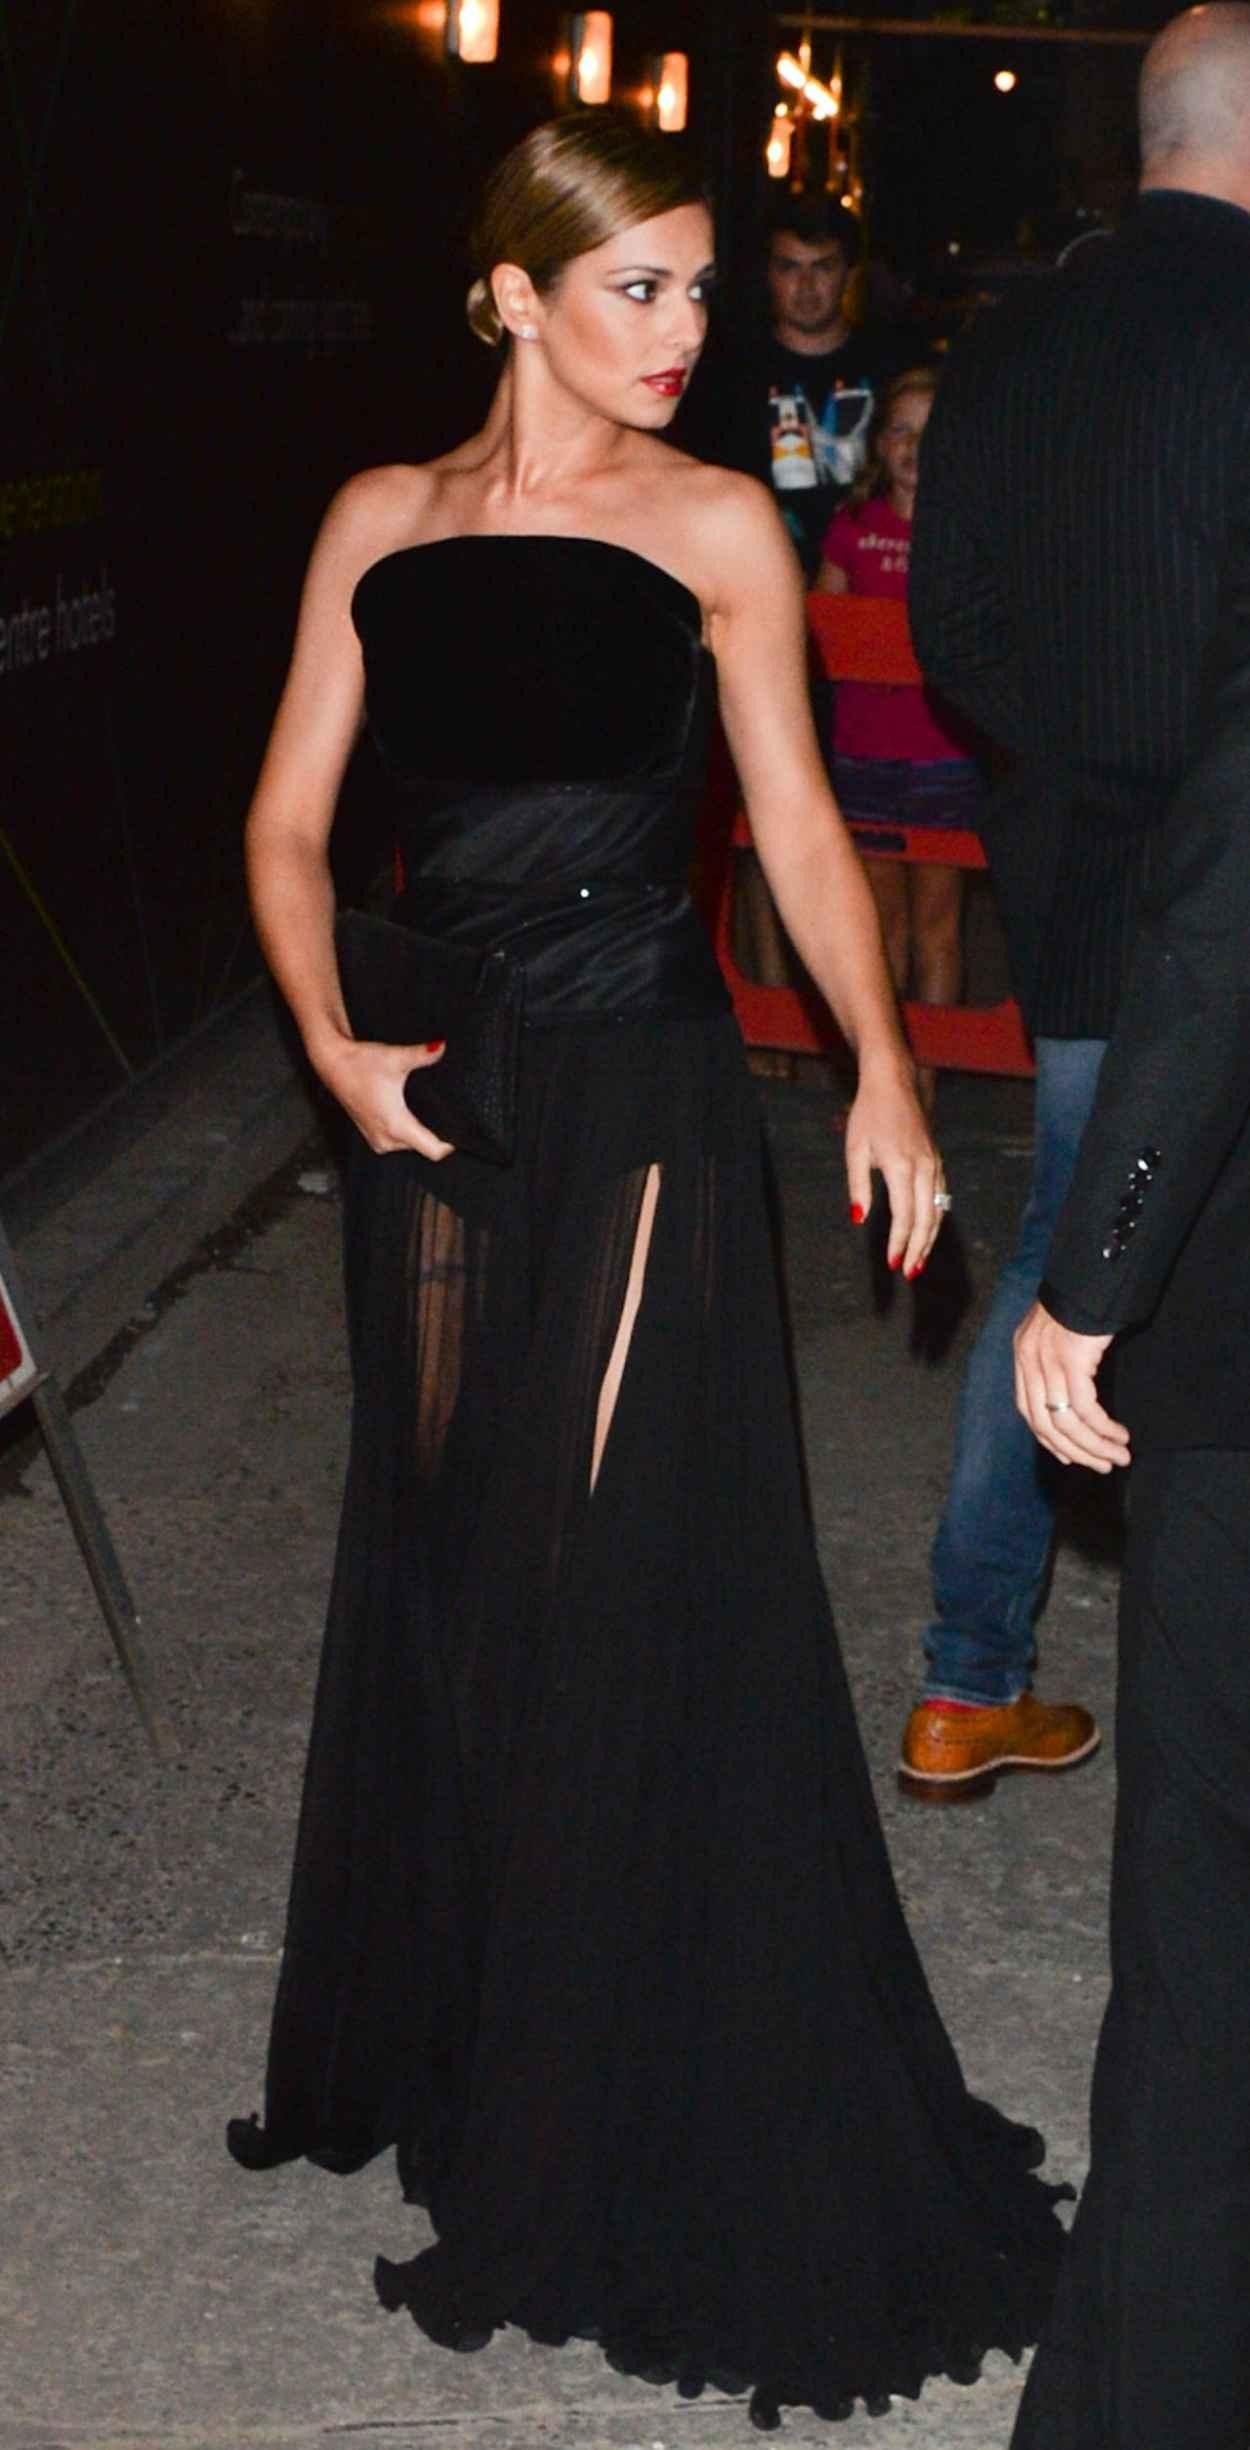 Cheryl Cole (Cheryl Fernandez-Versini) - Wedding Party in London - July 2015-2